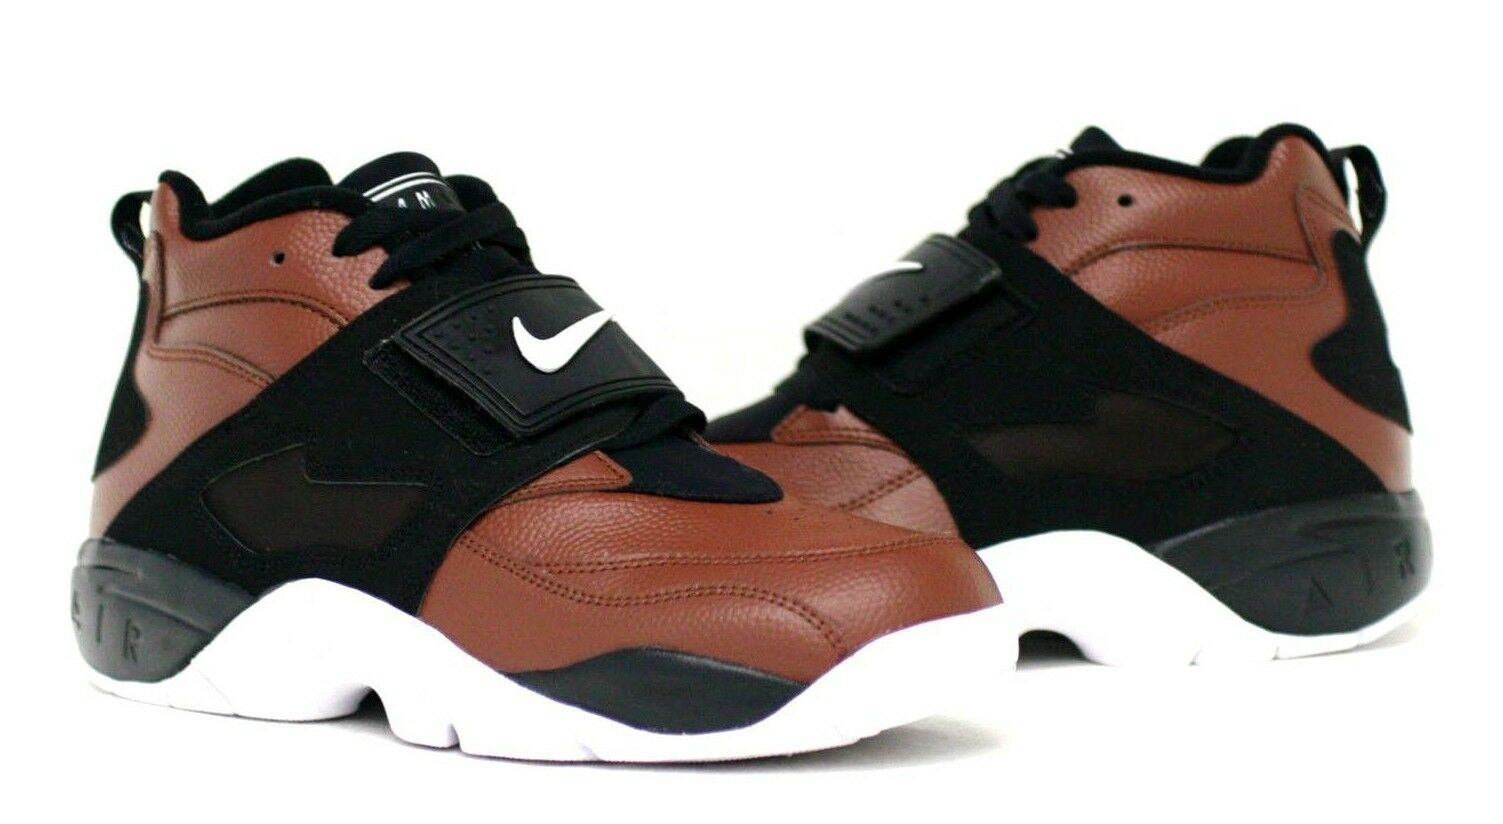 Nike Men's Shoes Air Diamond Turf